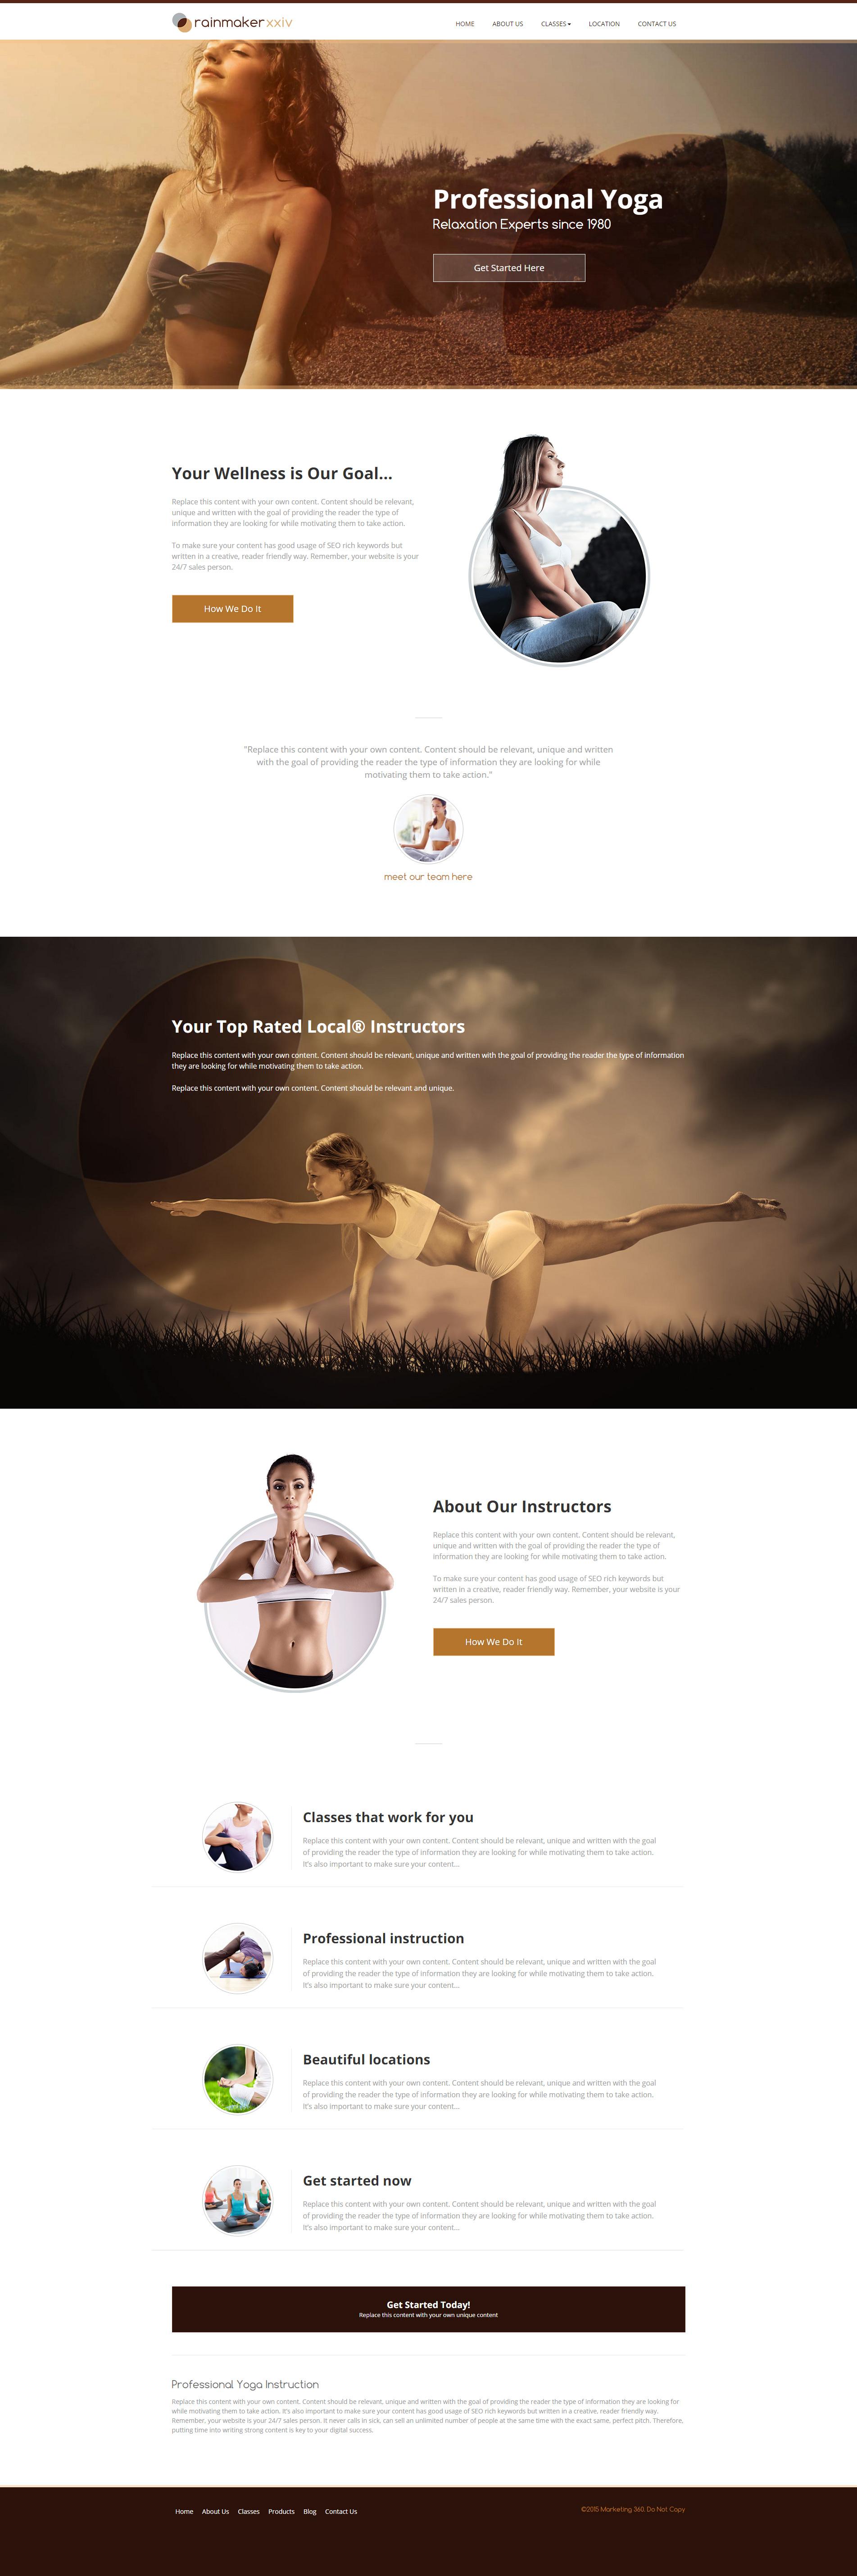 Yoga Websites Templates - Mobile Responsive Designs for Yoga Studios